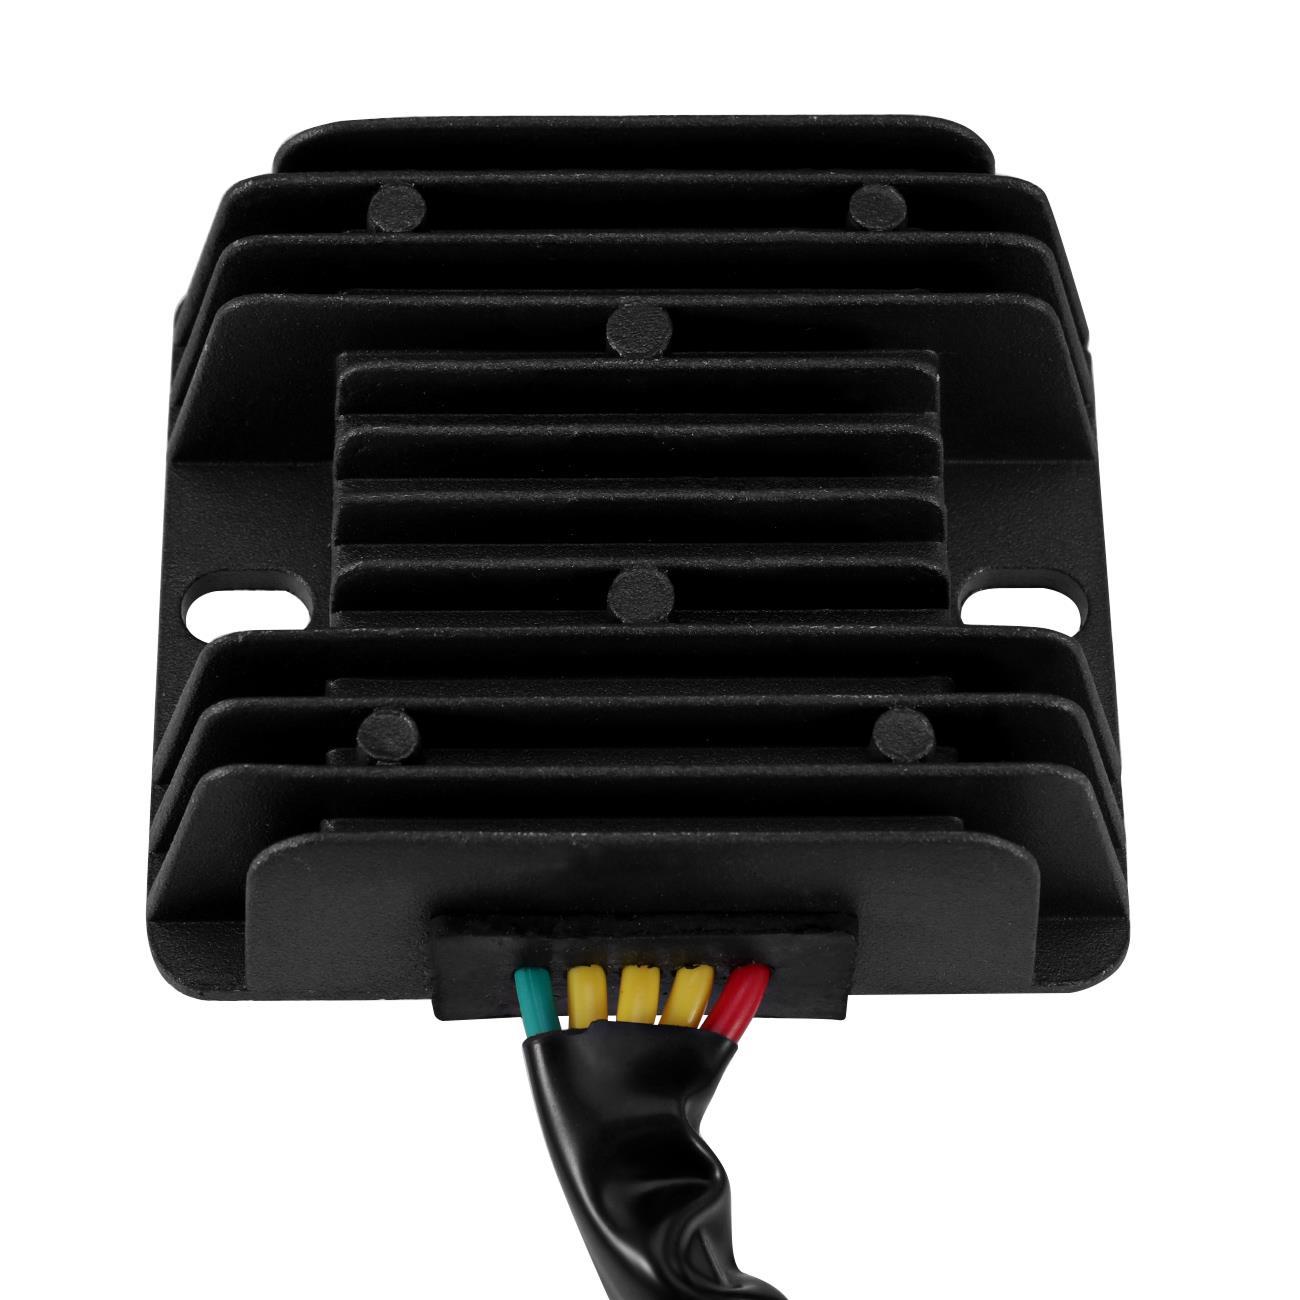 Voltage Regulator Rectifier For 2009 2013 Hyosung Gv Aquila Fi 250 2005 Gt 650 Wiring Diagram Motorcycle Gt650r Gt650 Comet Gv650 St7 Gt650s